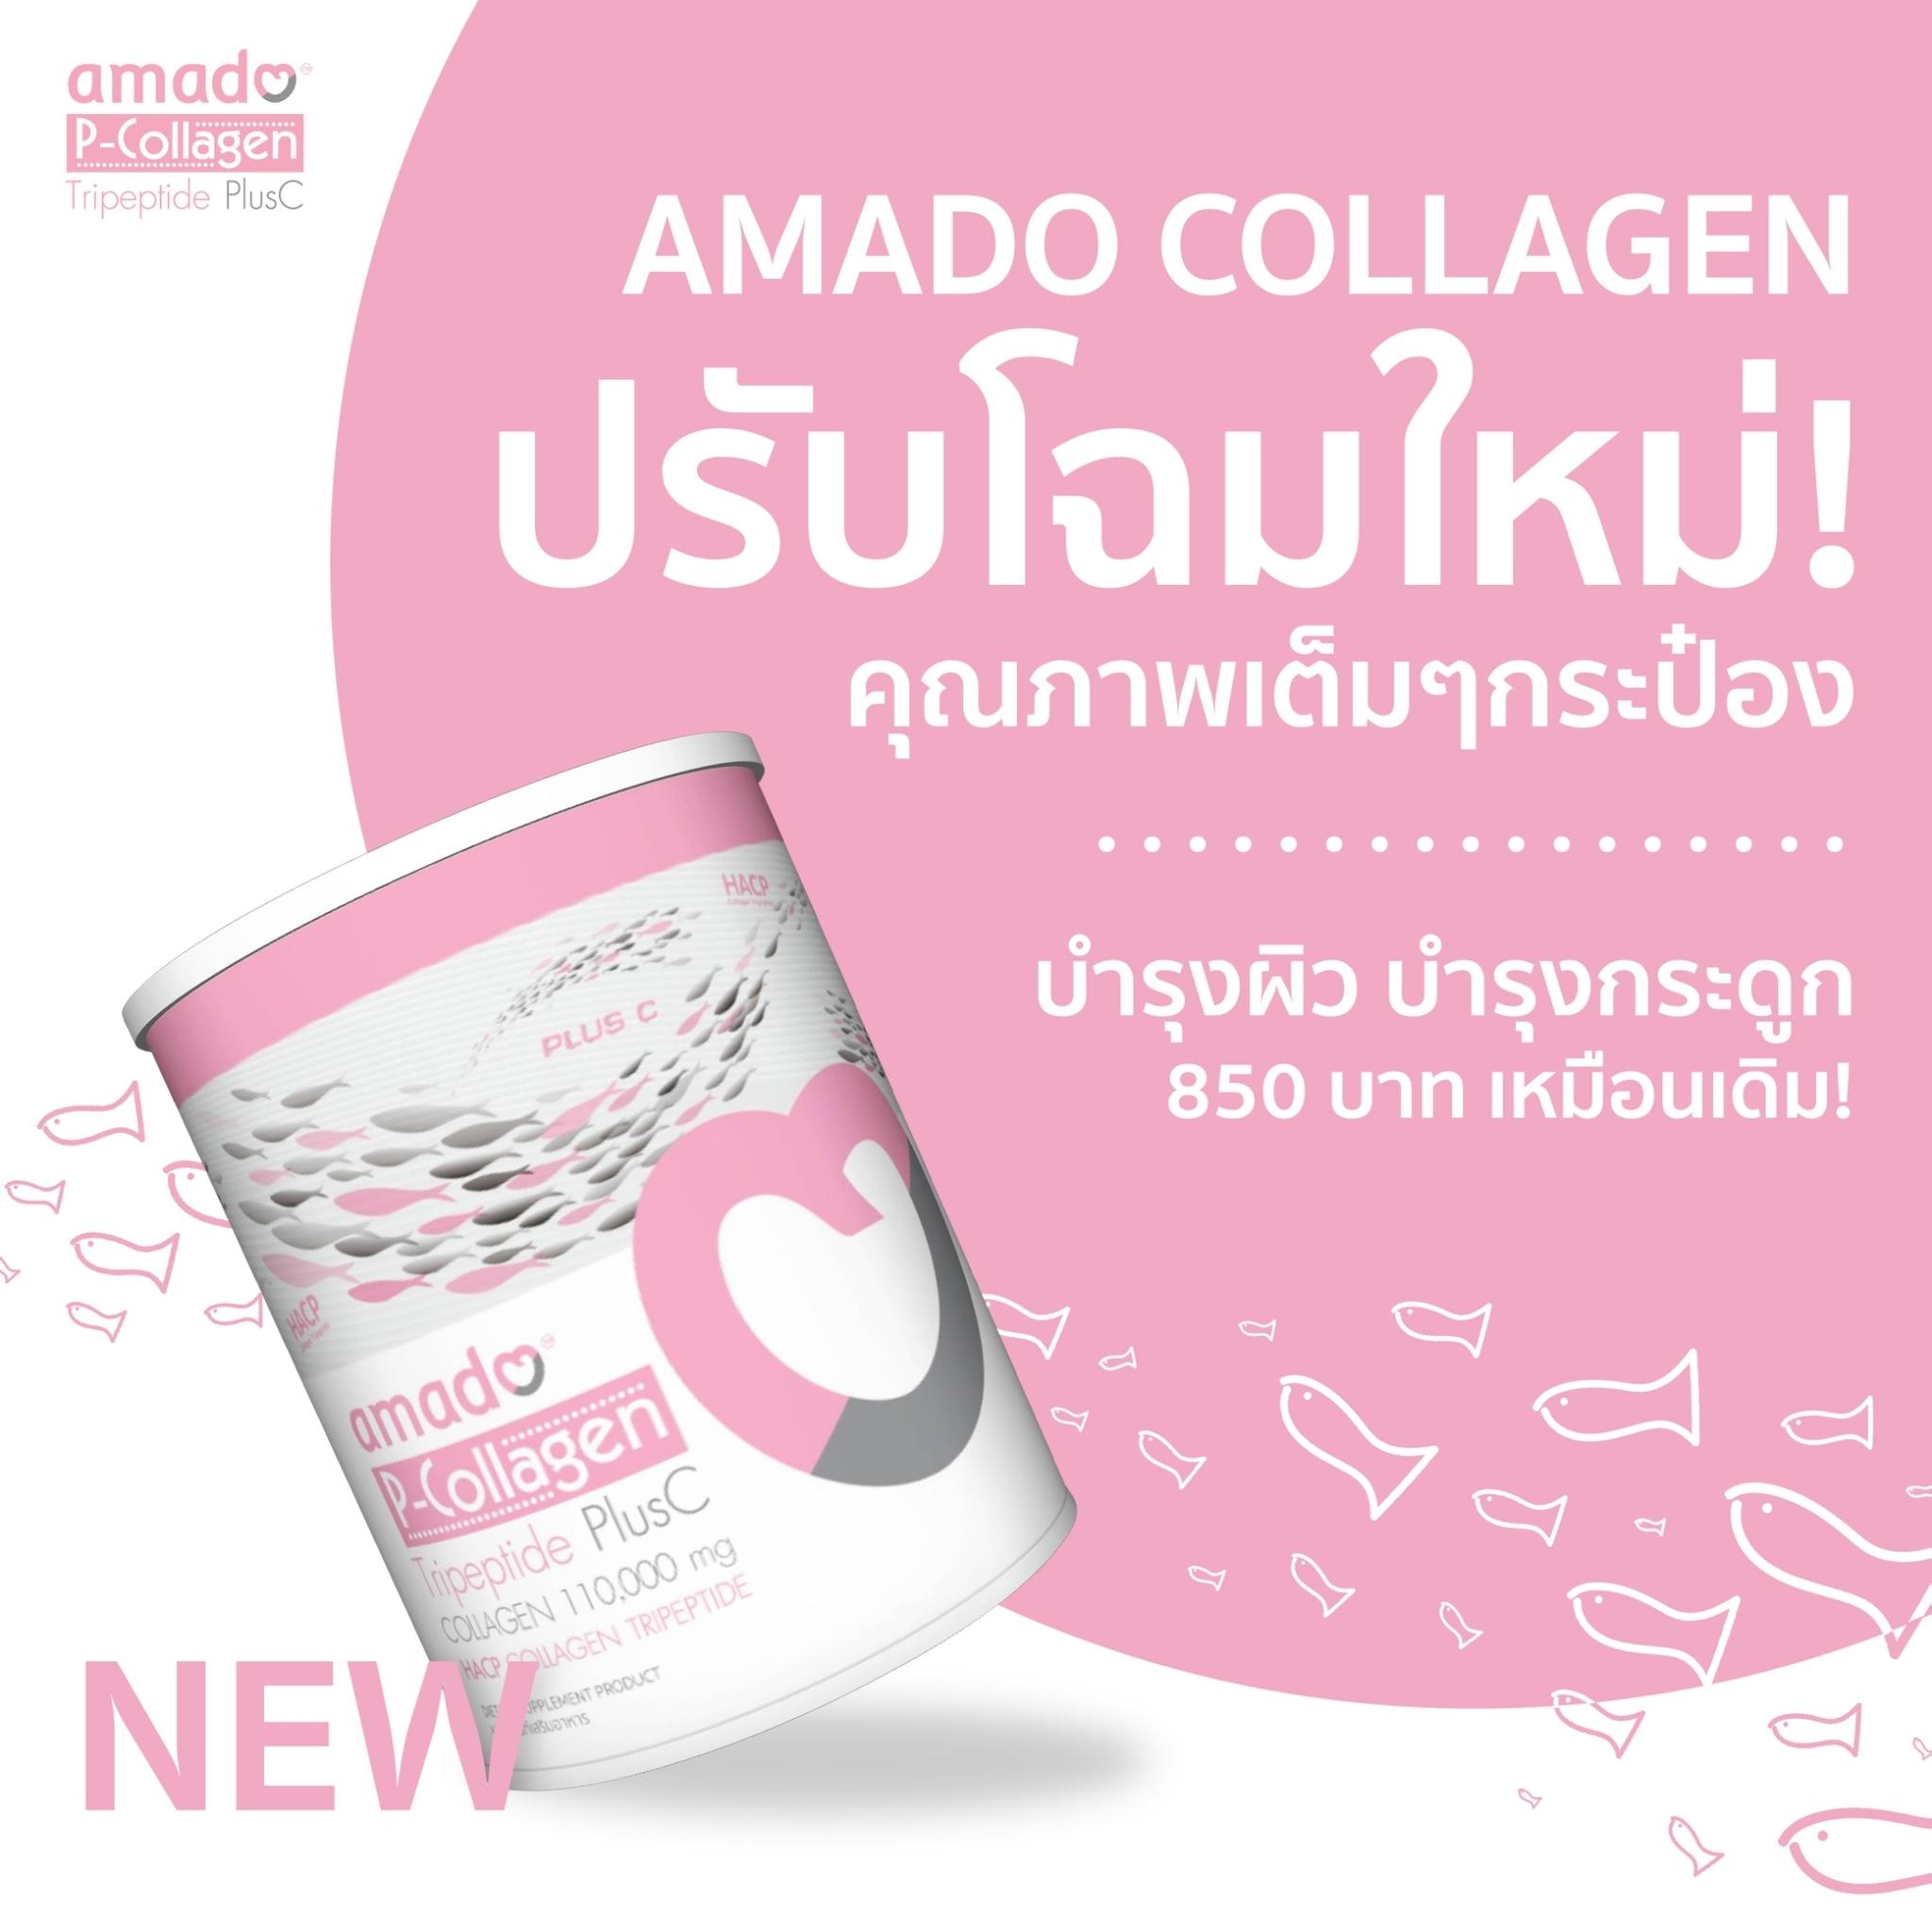 amado collagen